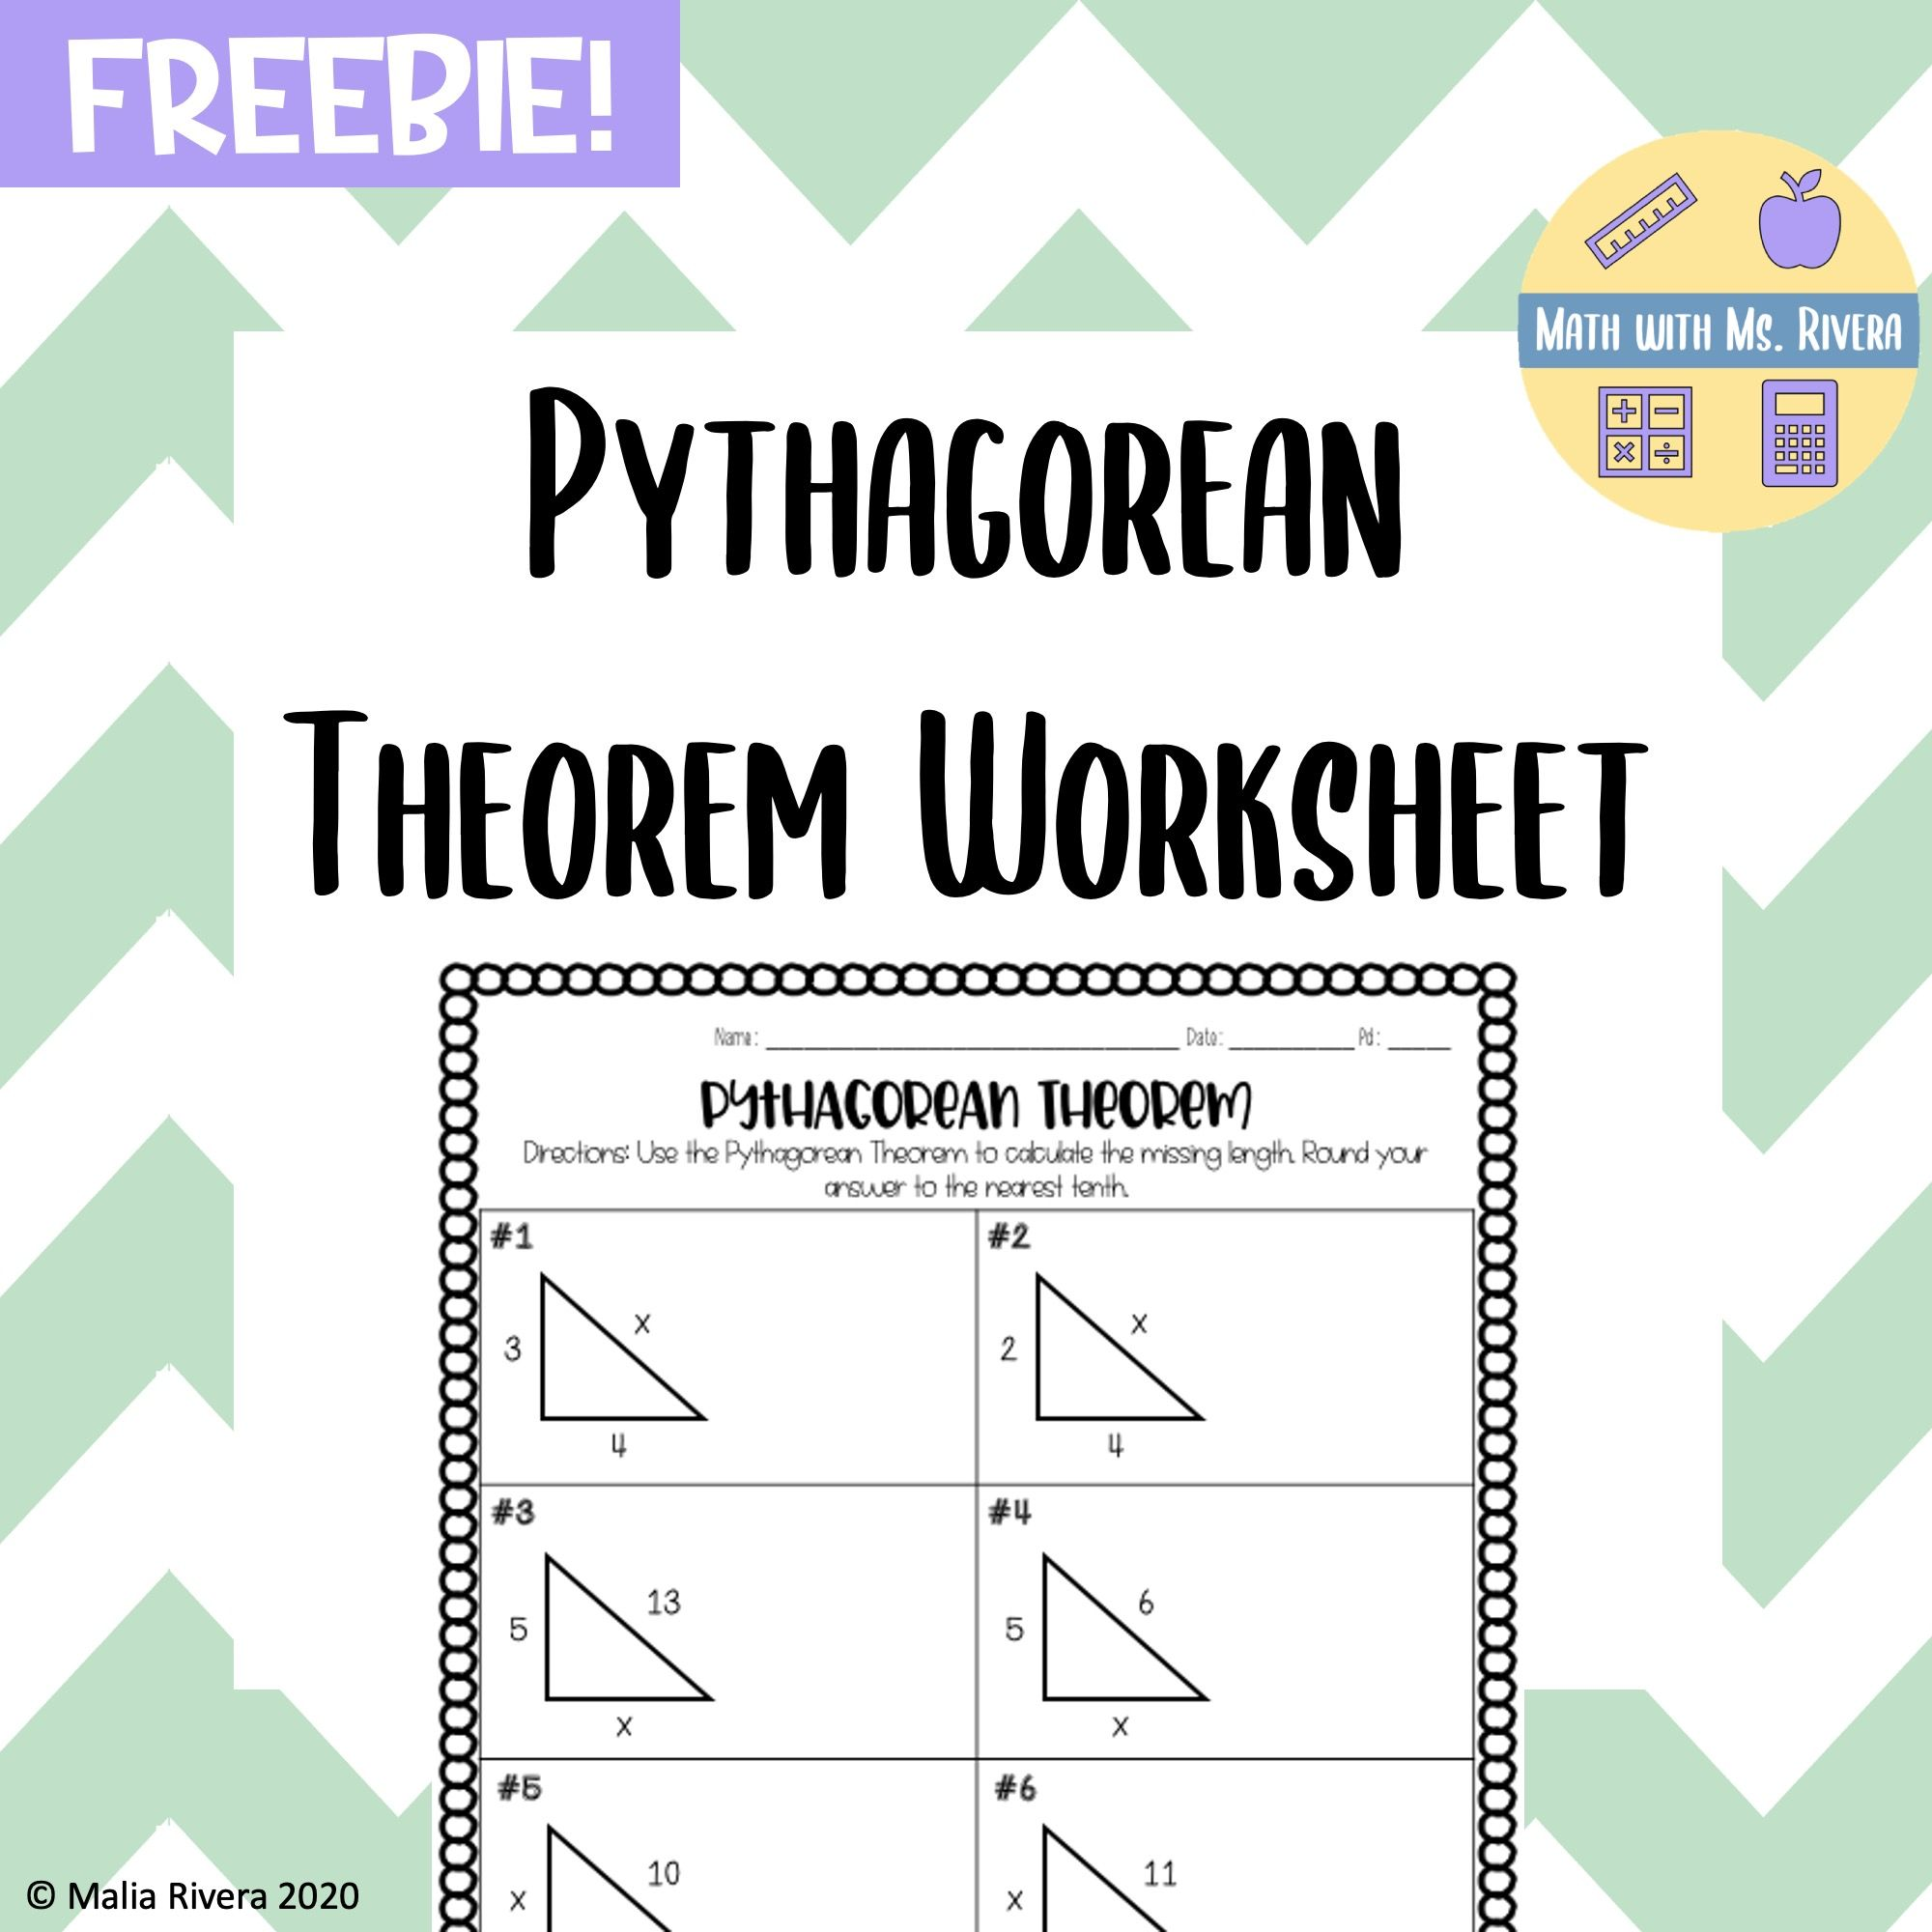 Pythagorean Theorem Worksheet FREEBIE in 2020